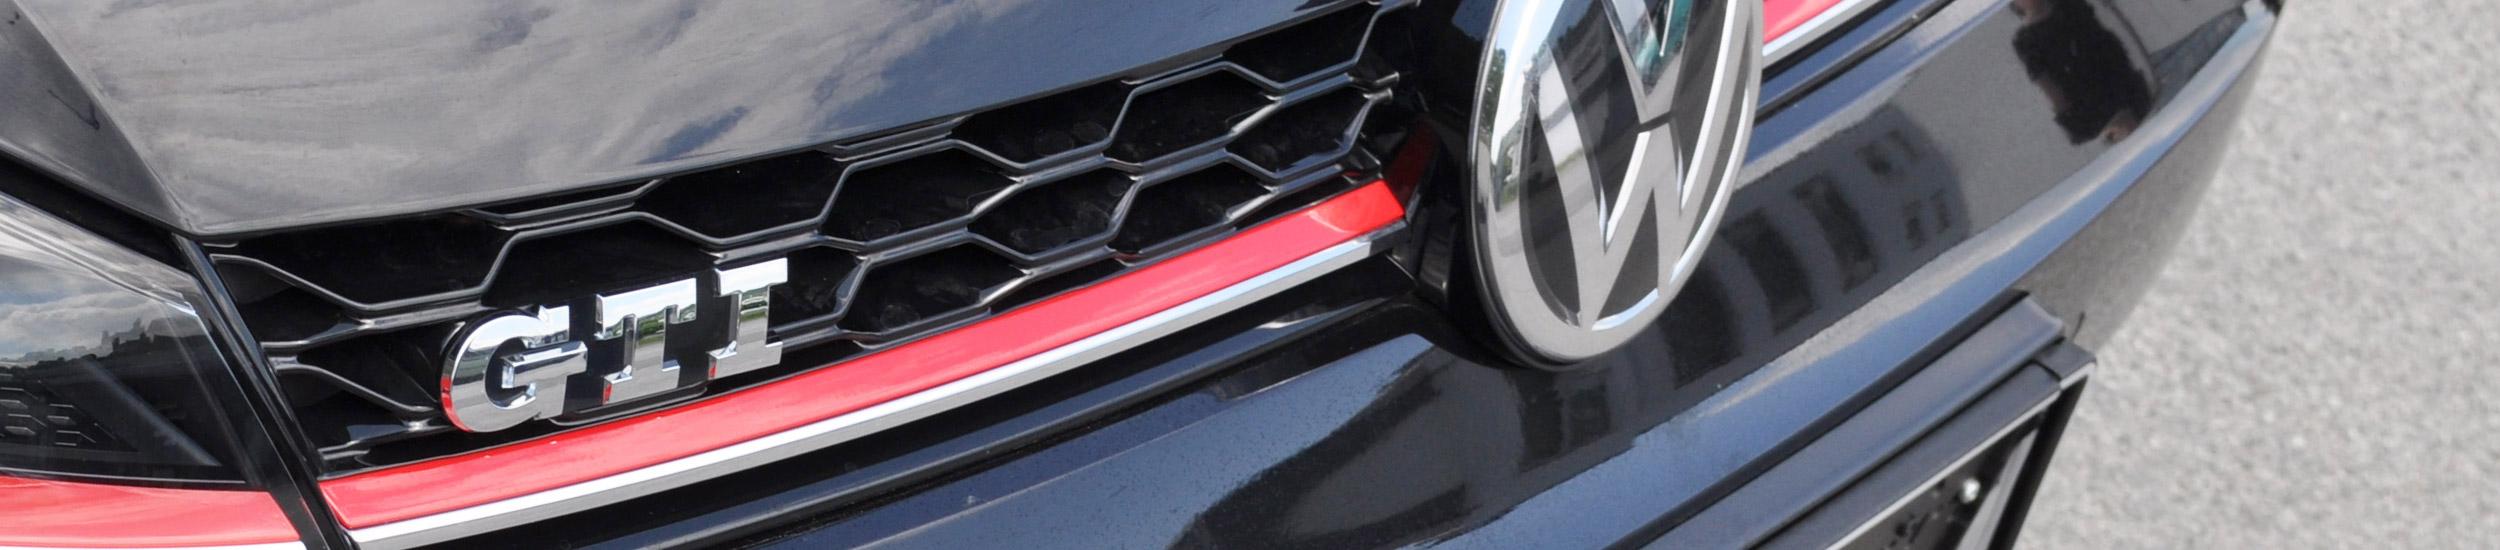 NEU - VW Golf GTI mit DSG - bei Sparmobile